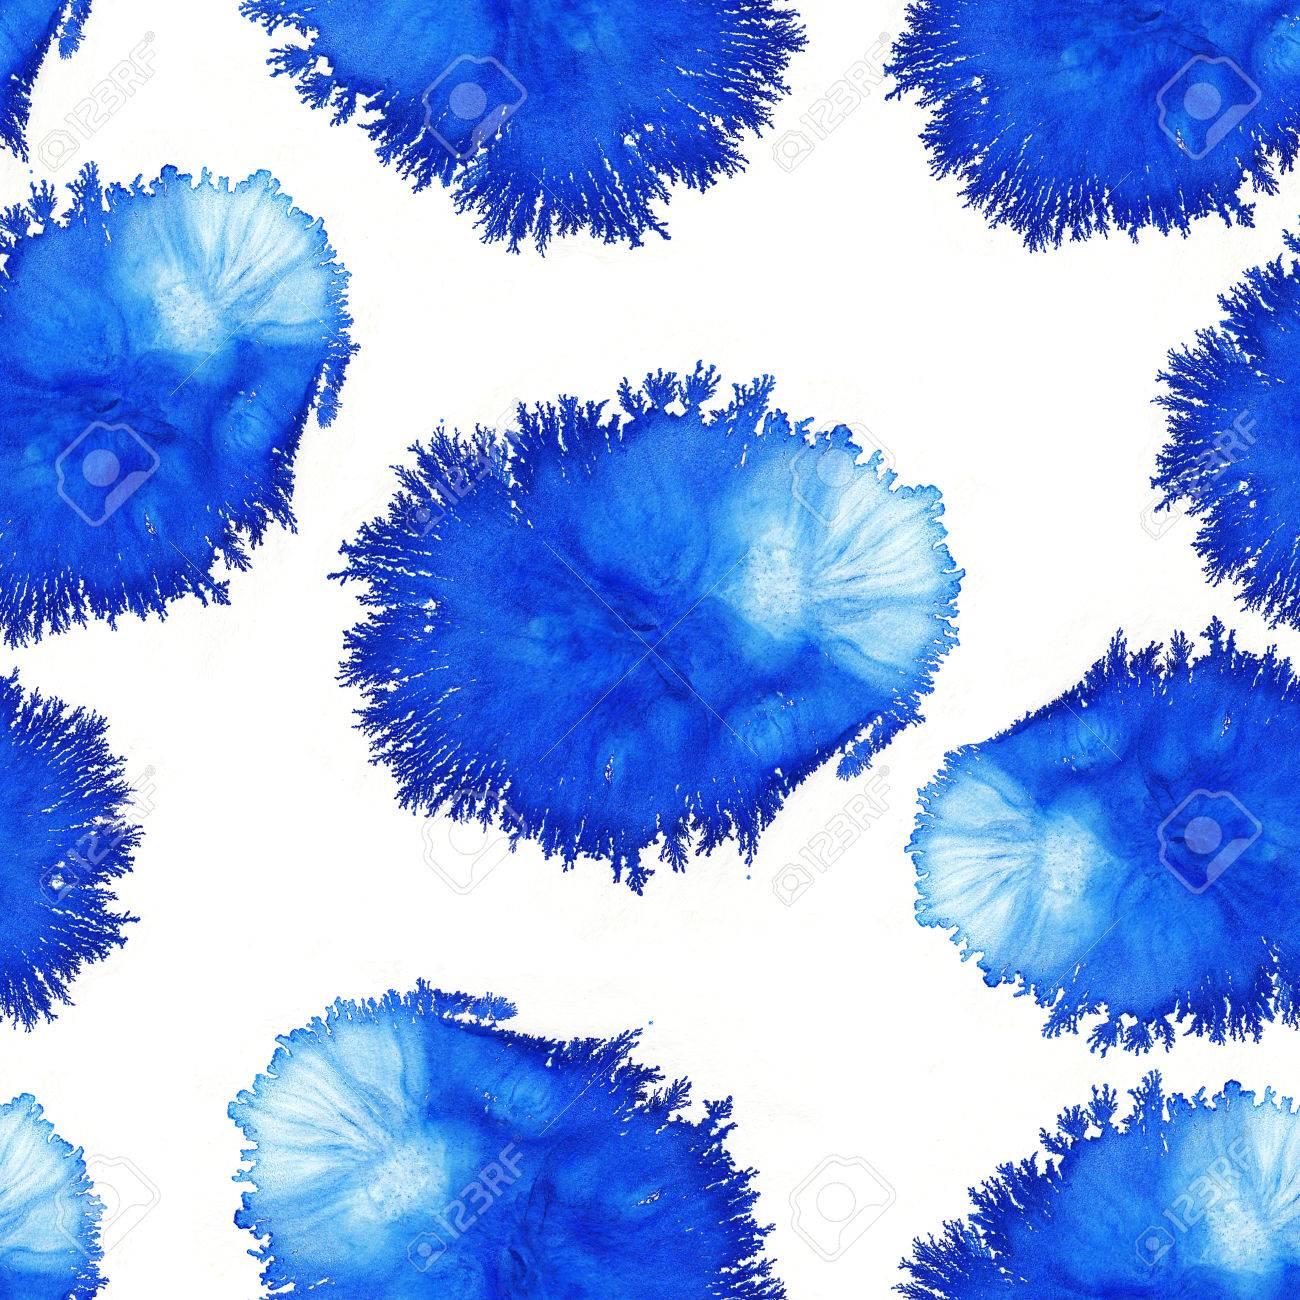 farben aquarell blaue muster runde aquarellflecken aquarell rundet hintergrund - Rentabilittsvorschau Muster